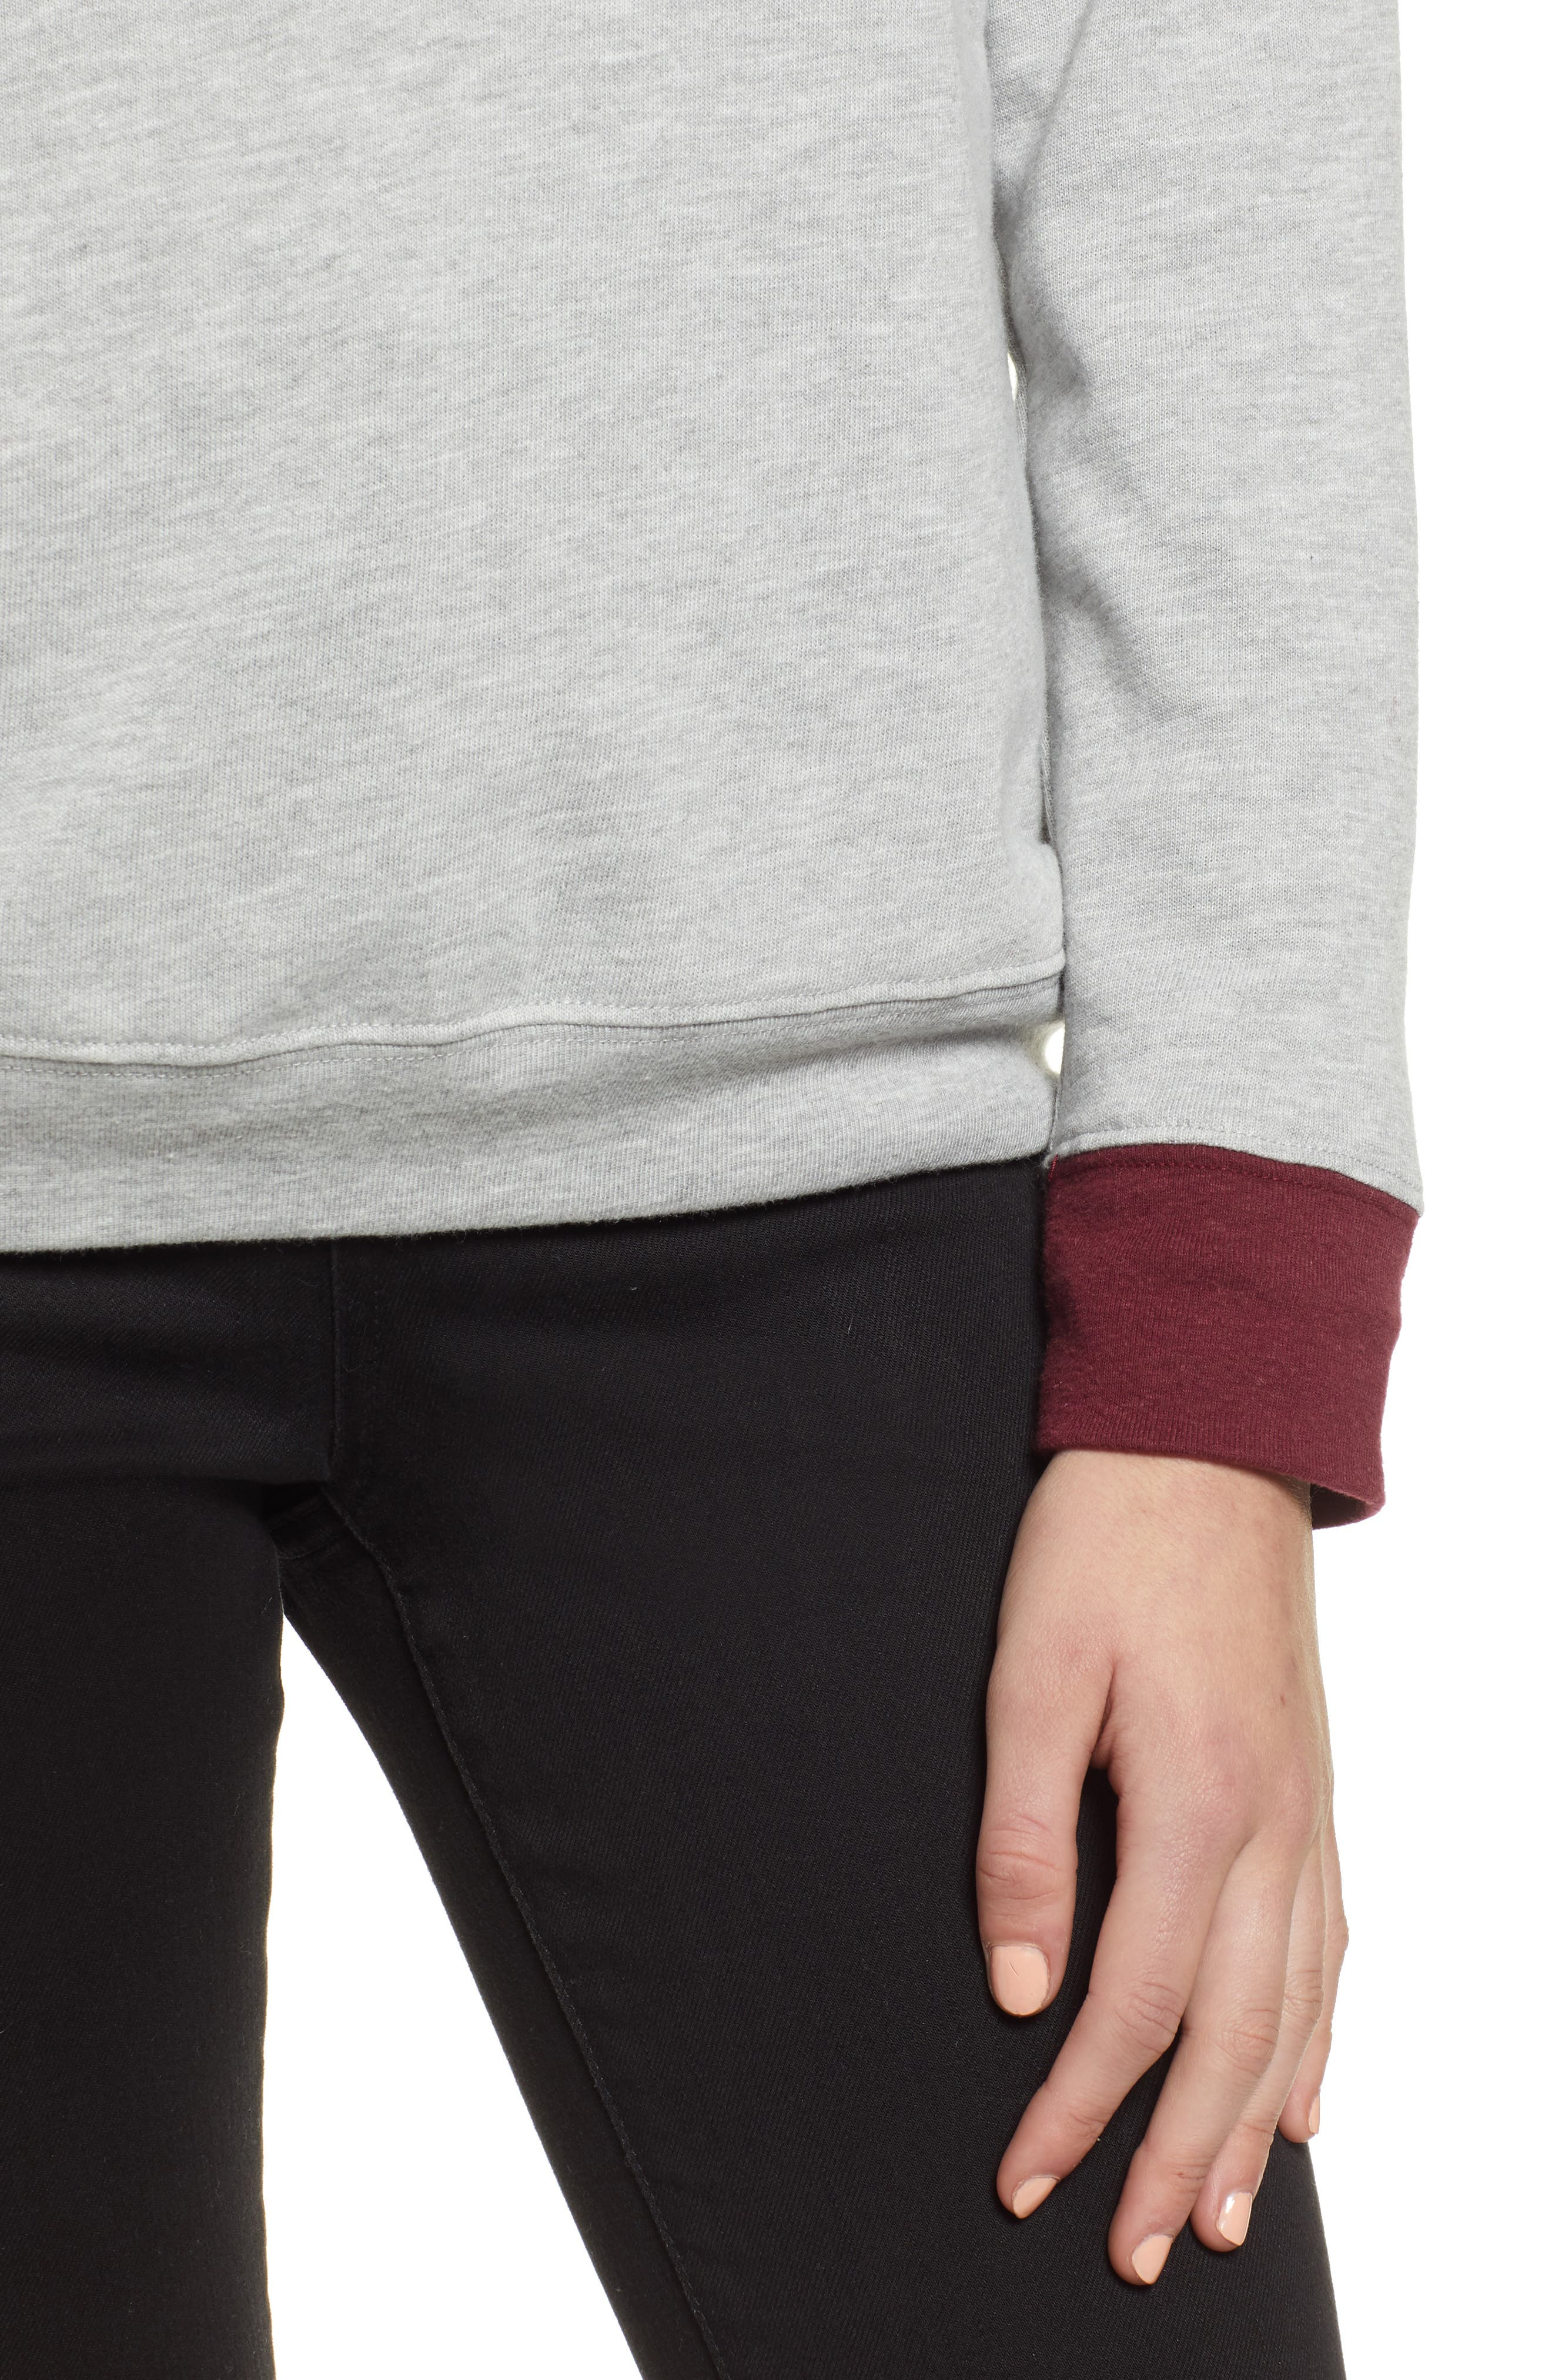 TREASURE & BOND, Crewneck Sweatshirt, Alternate thumbnail 4, color, GREY HEATHER- RED TANNIN COMBO